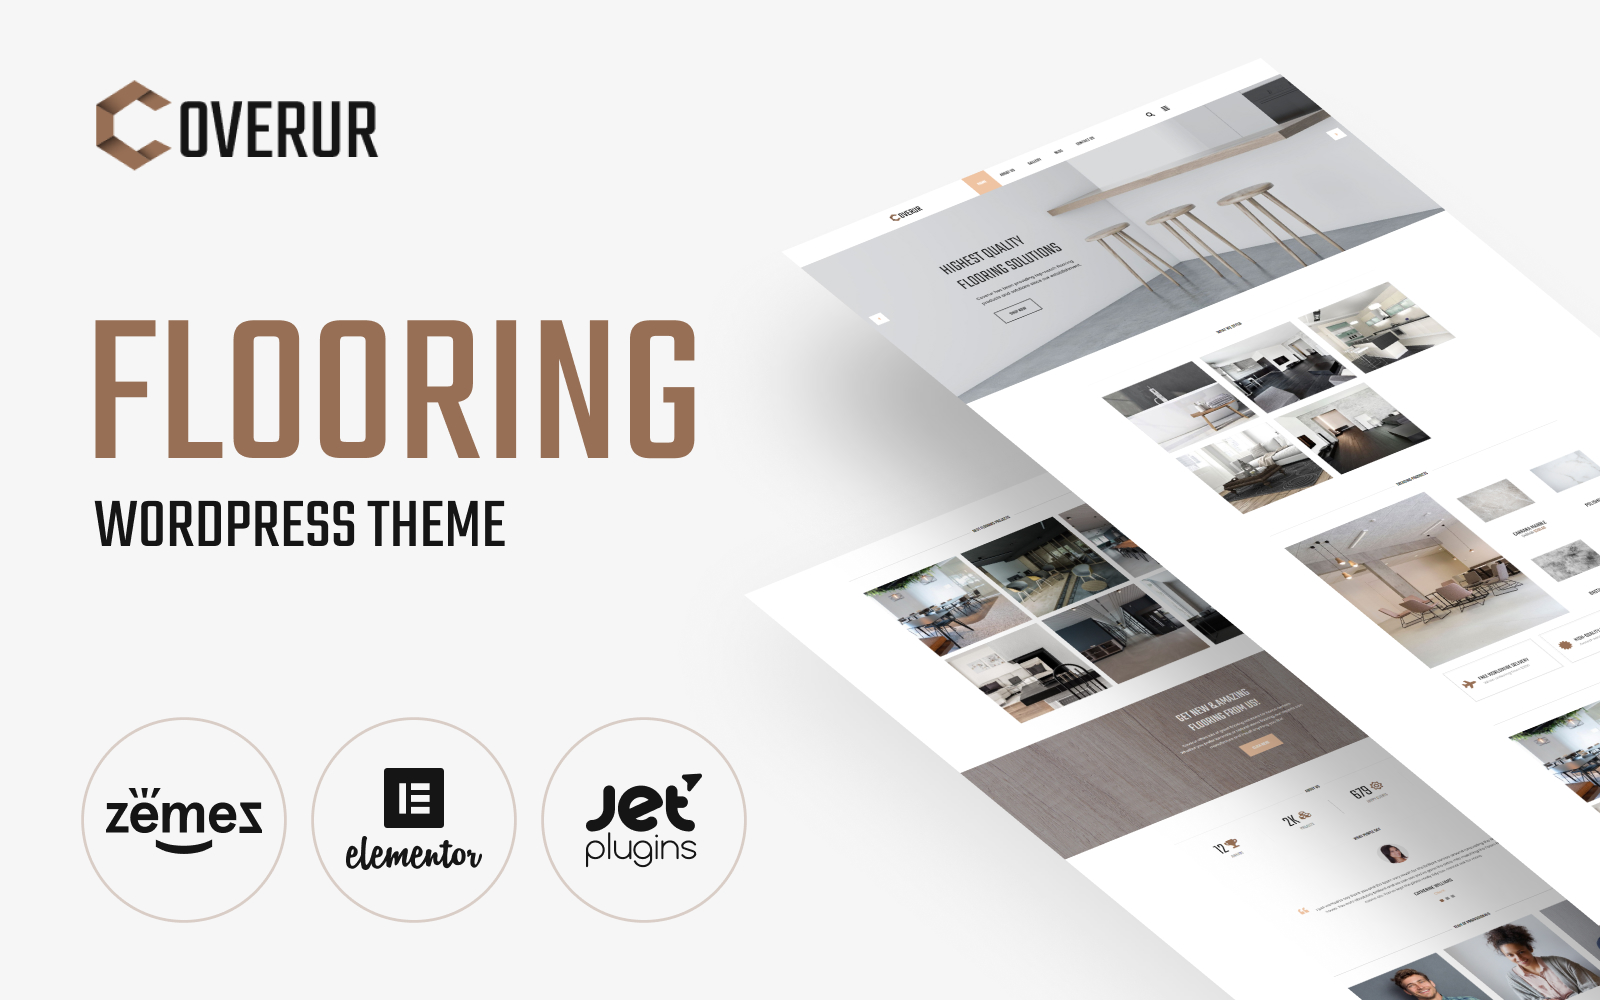 Responsive Coverur - Flooring Company Multipurpose Minimal Elementor Wordpress #81169